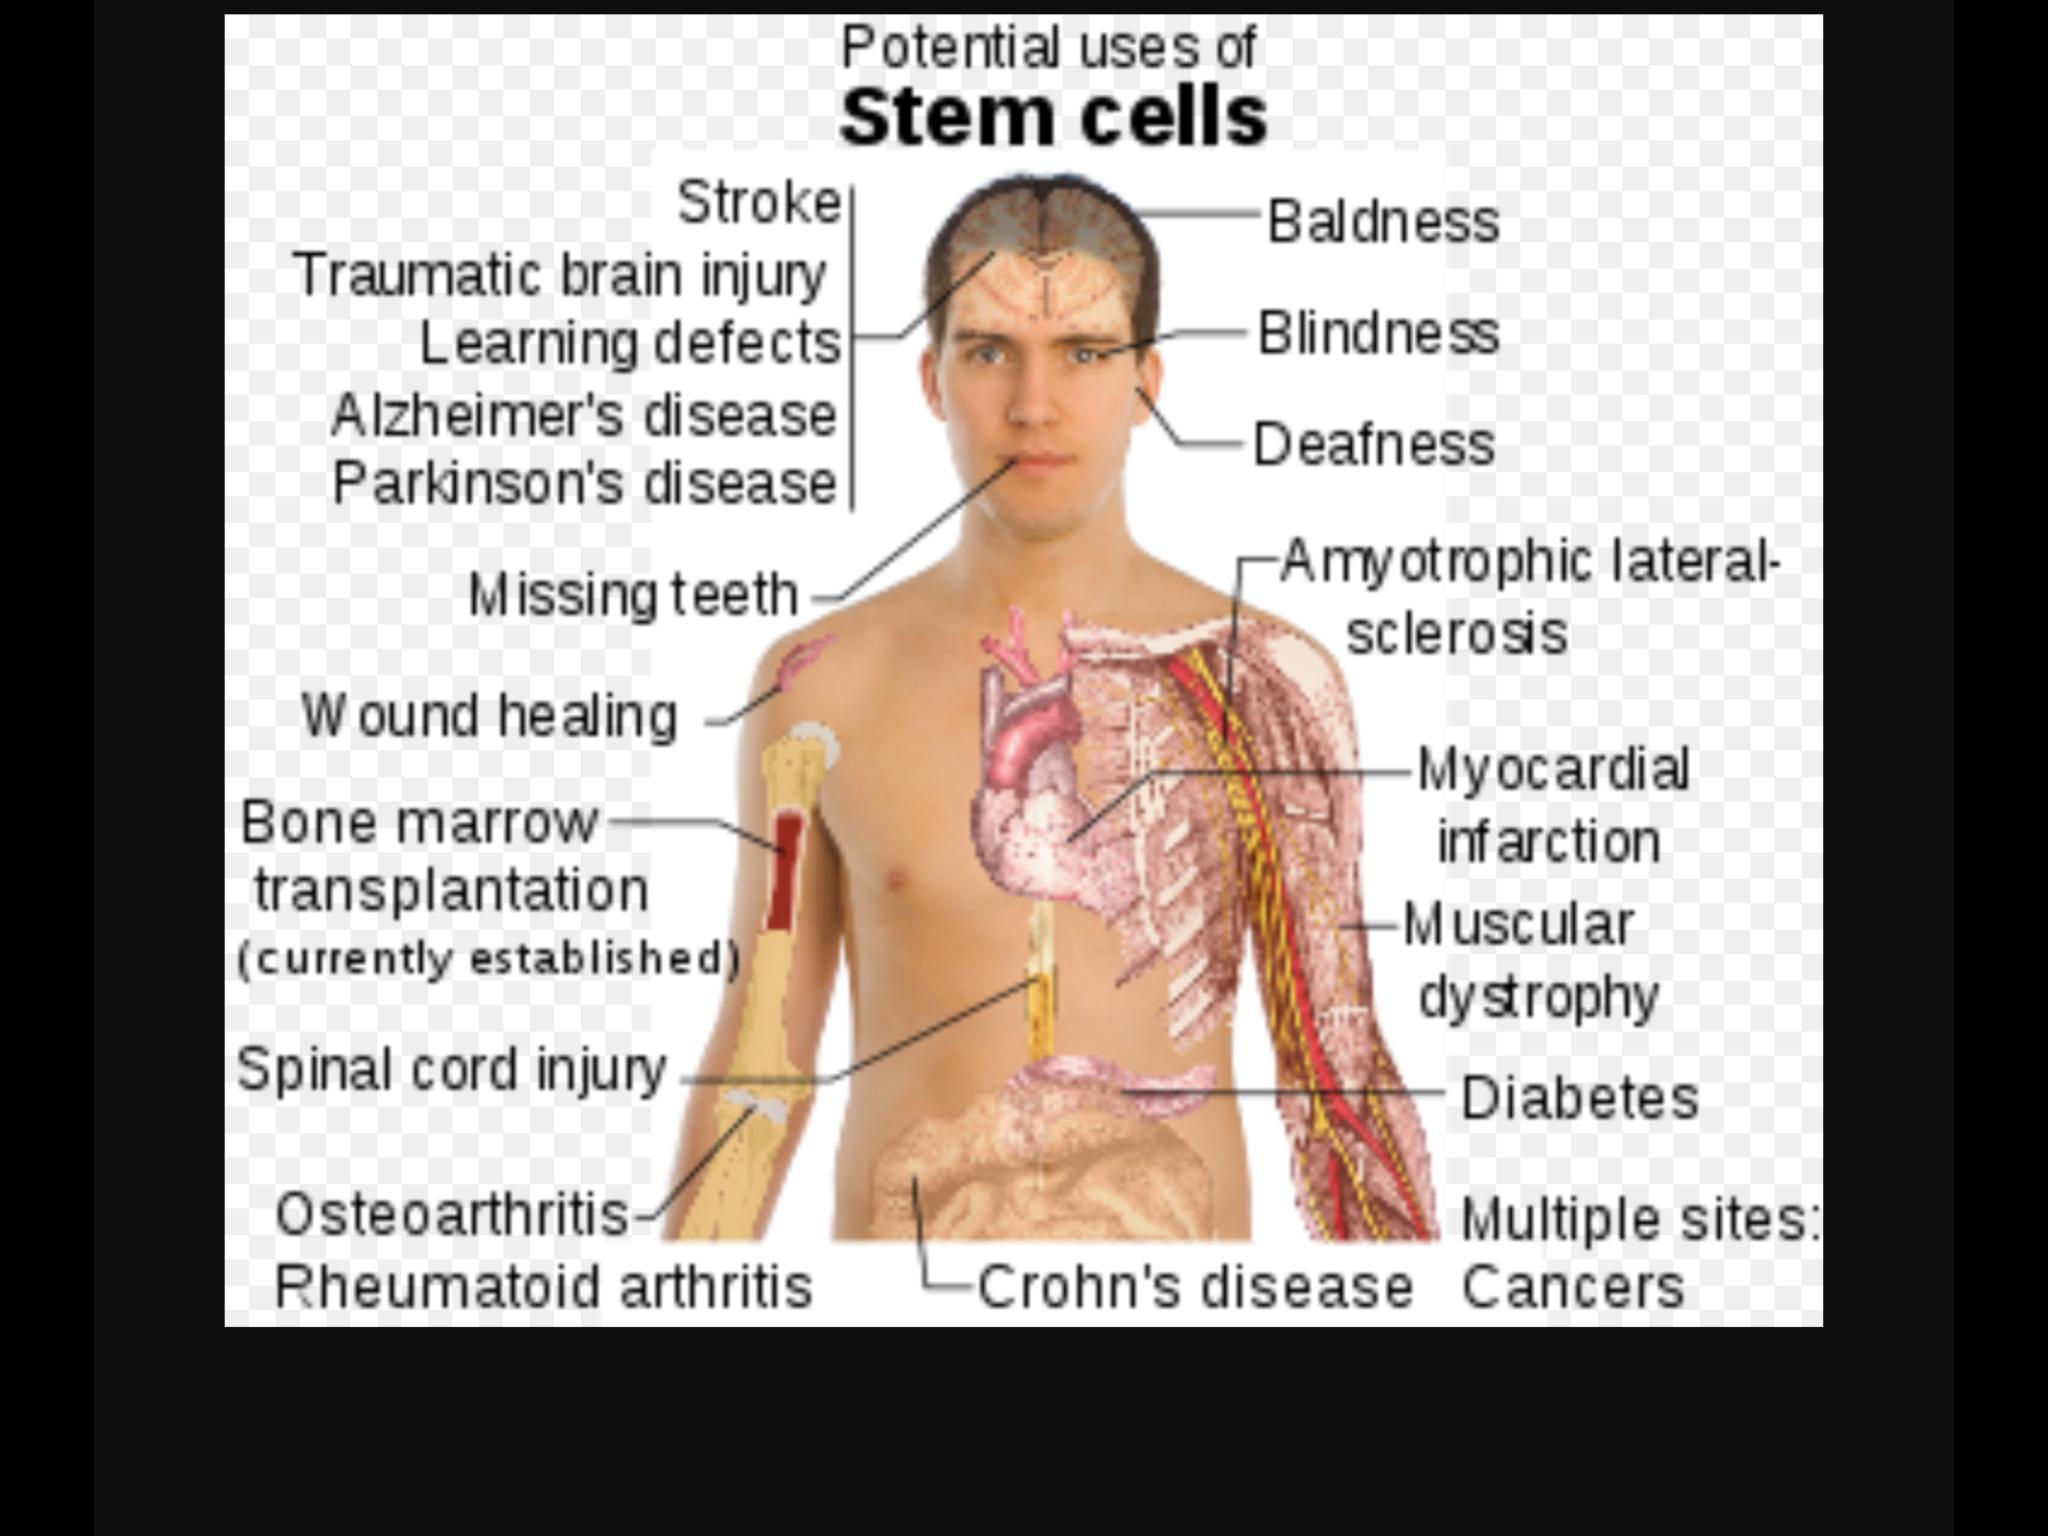 Embryonic Stem Cells by Antonia Portelos